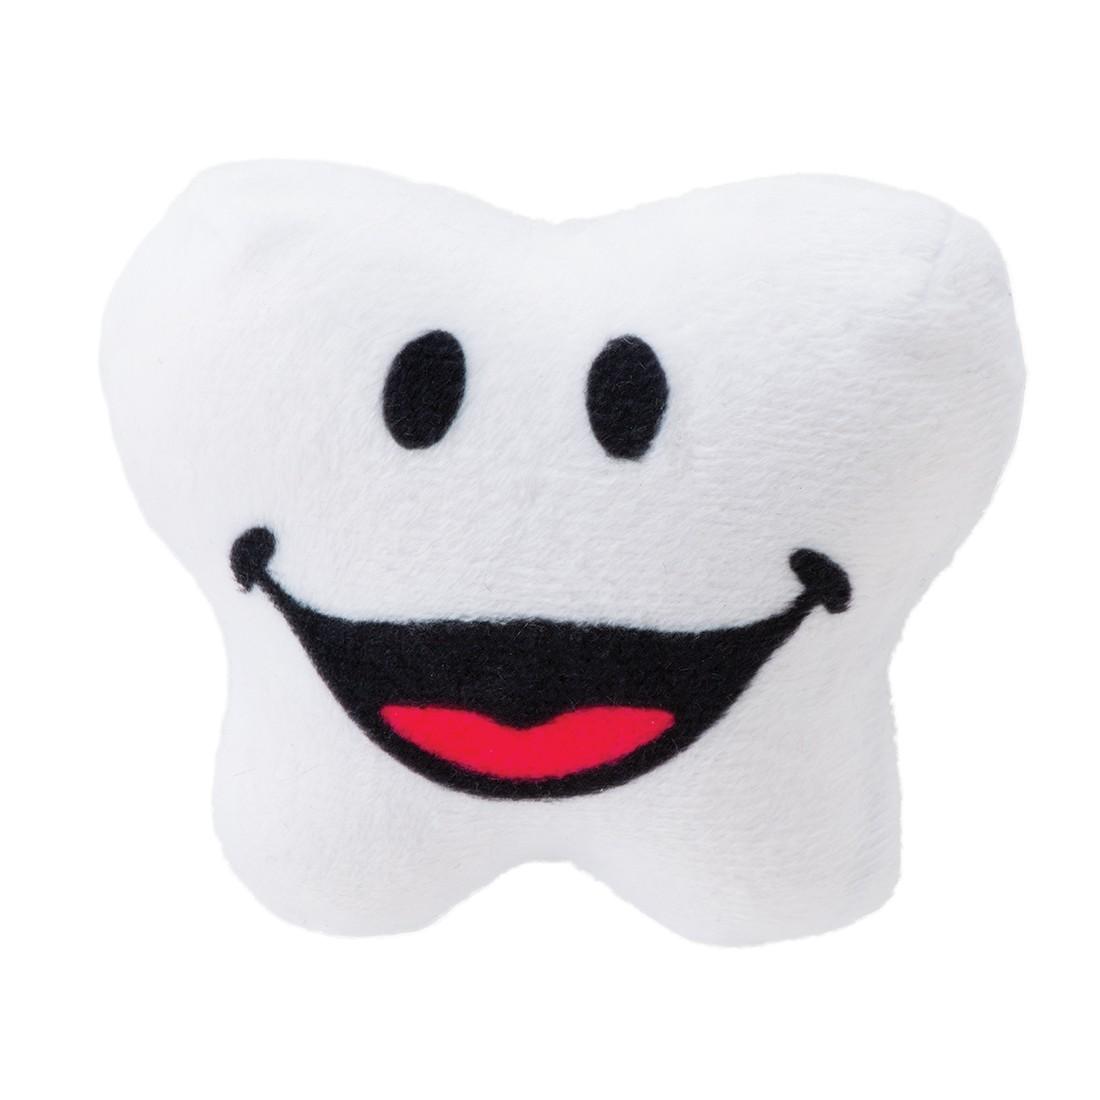 Squishie Happy Tooth Plush [image]